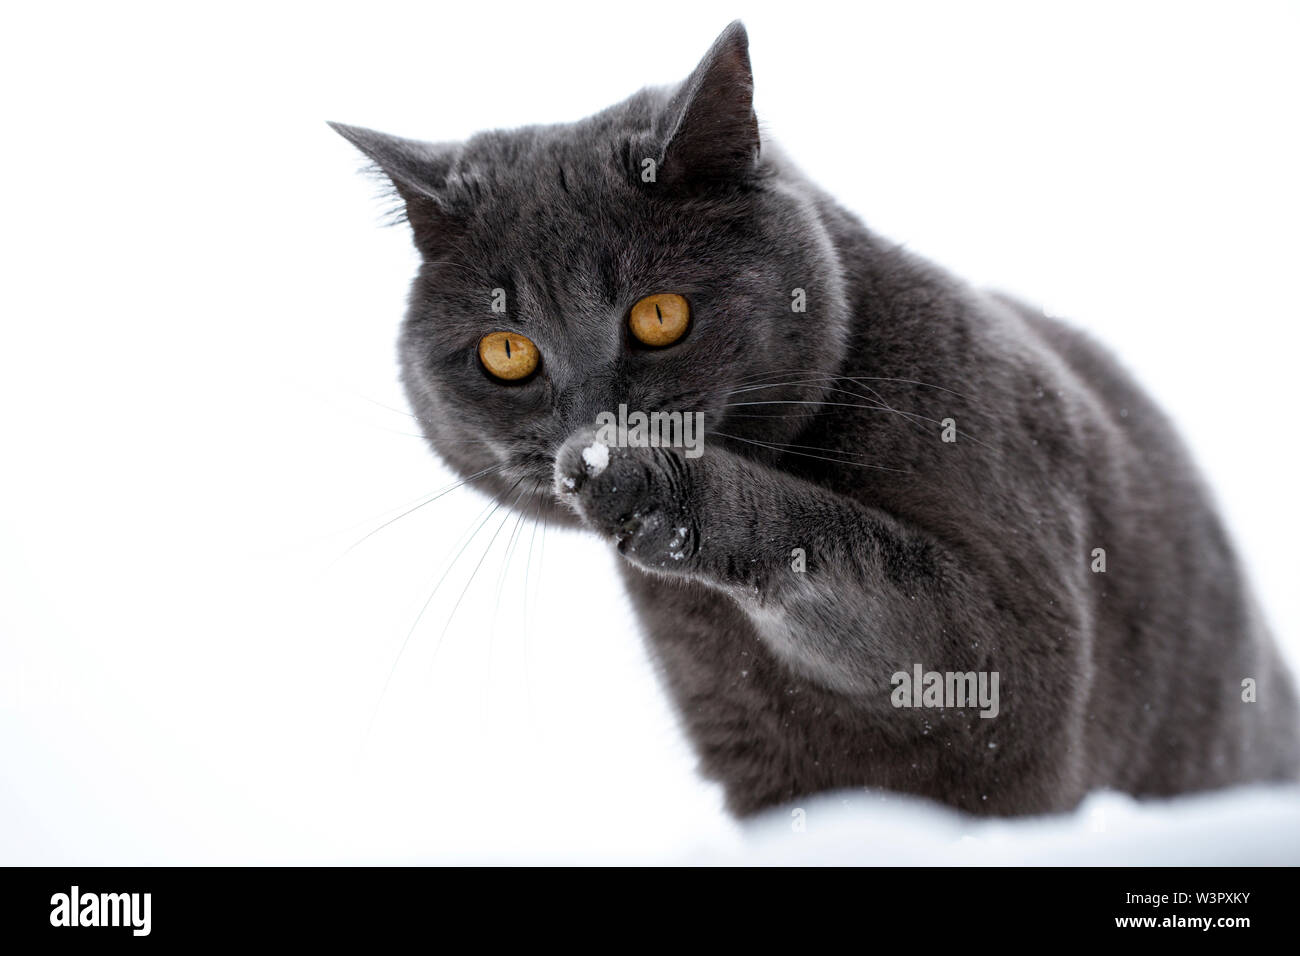 Black tom cat  Black and White Cat Names  2019-06-07